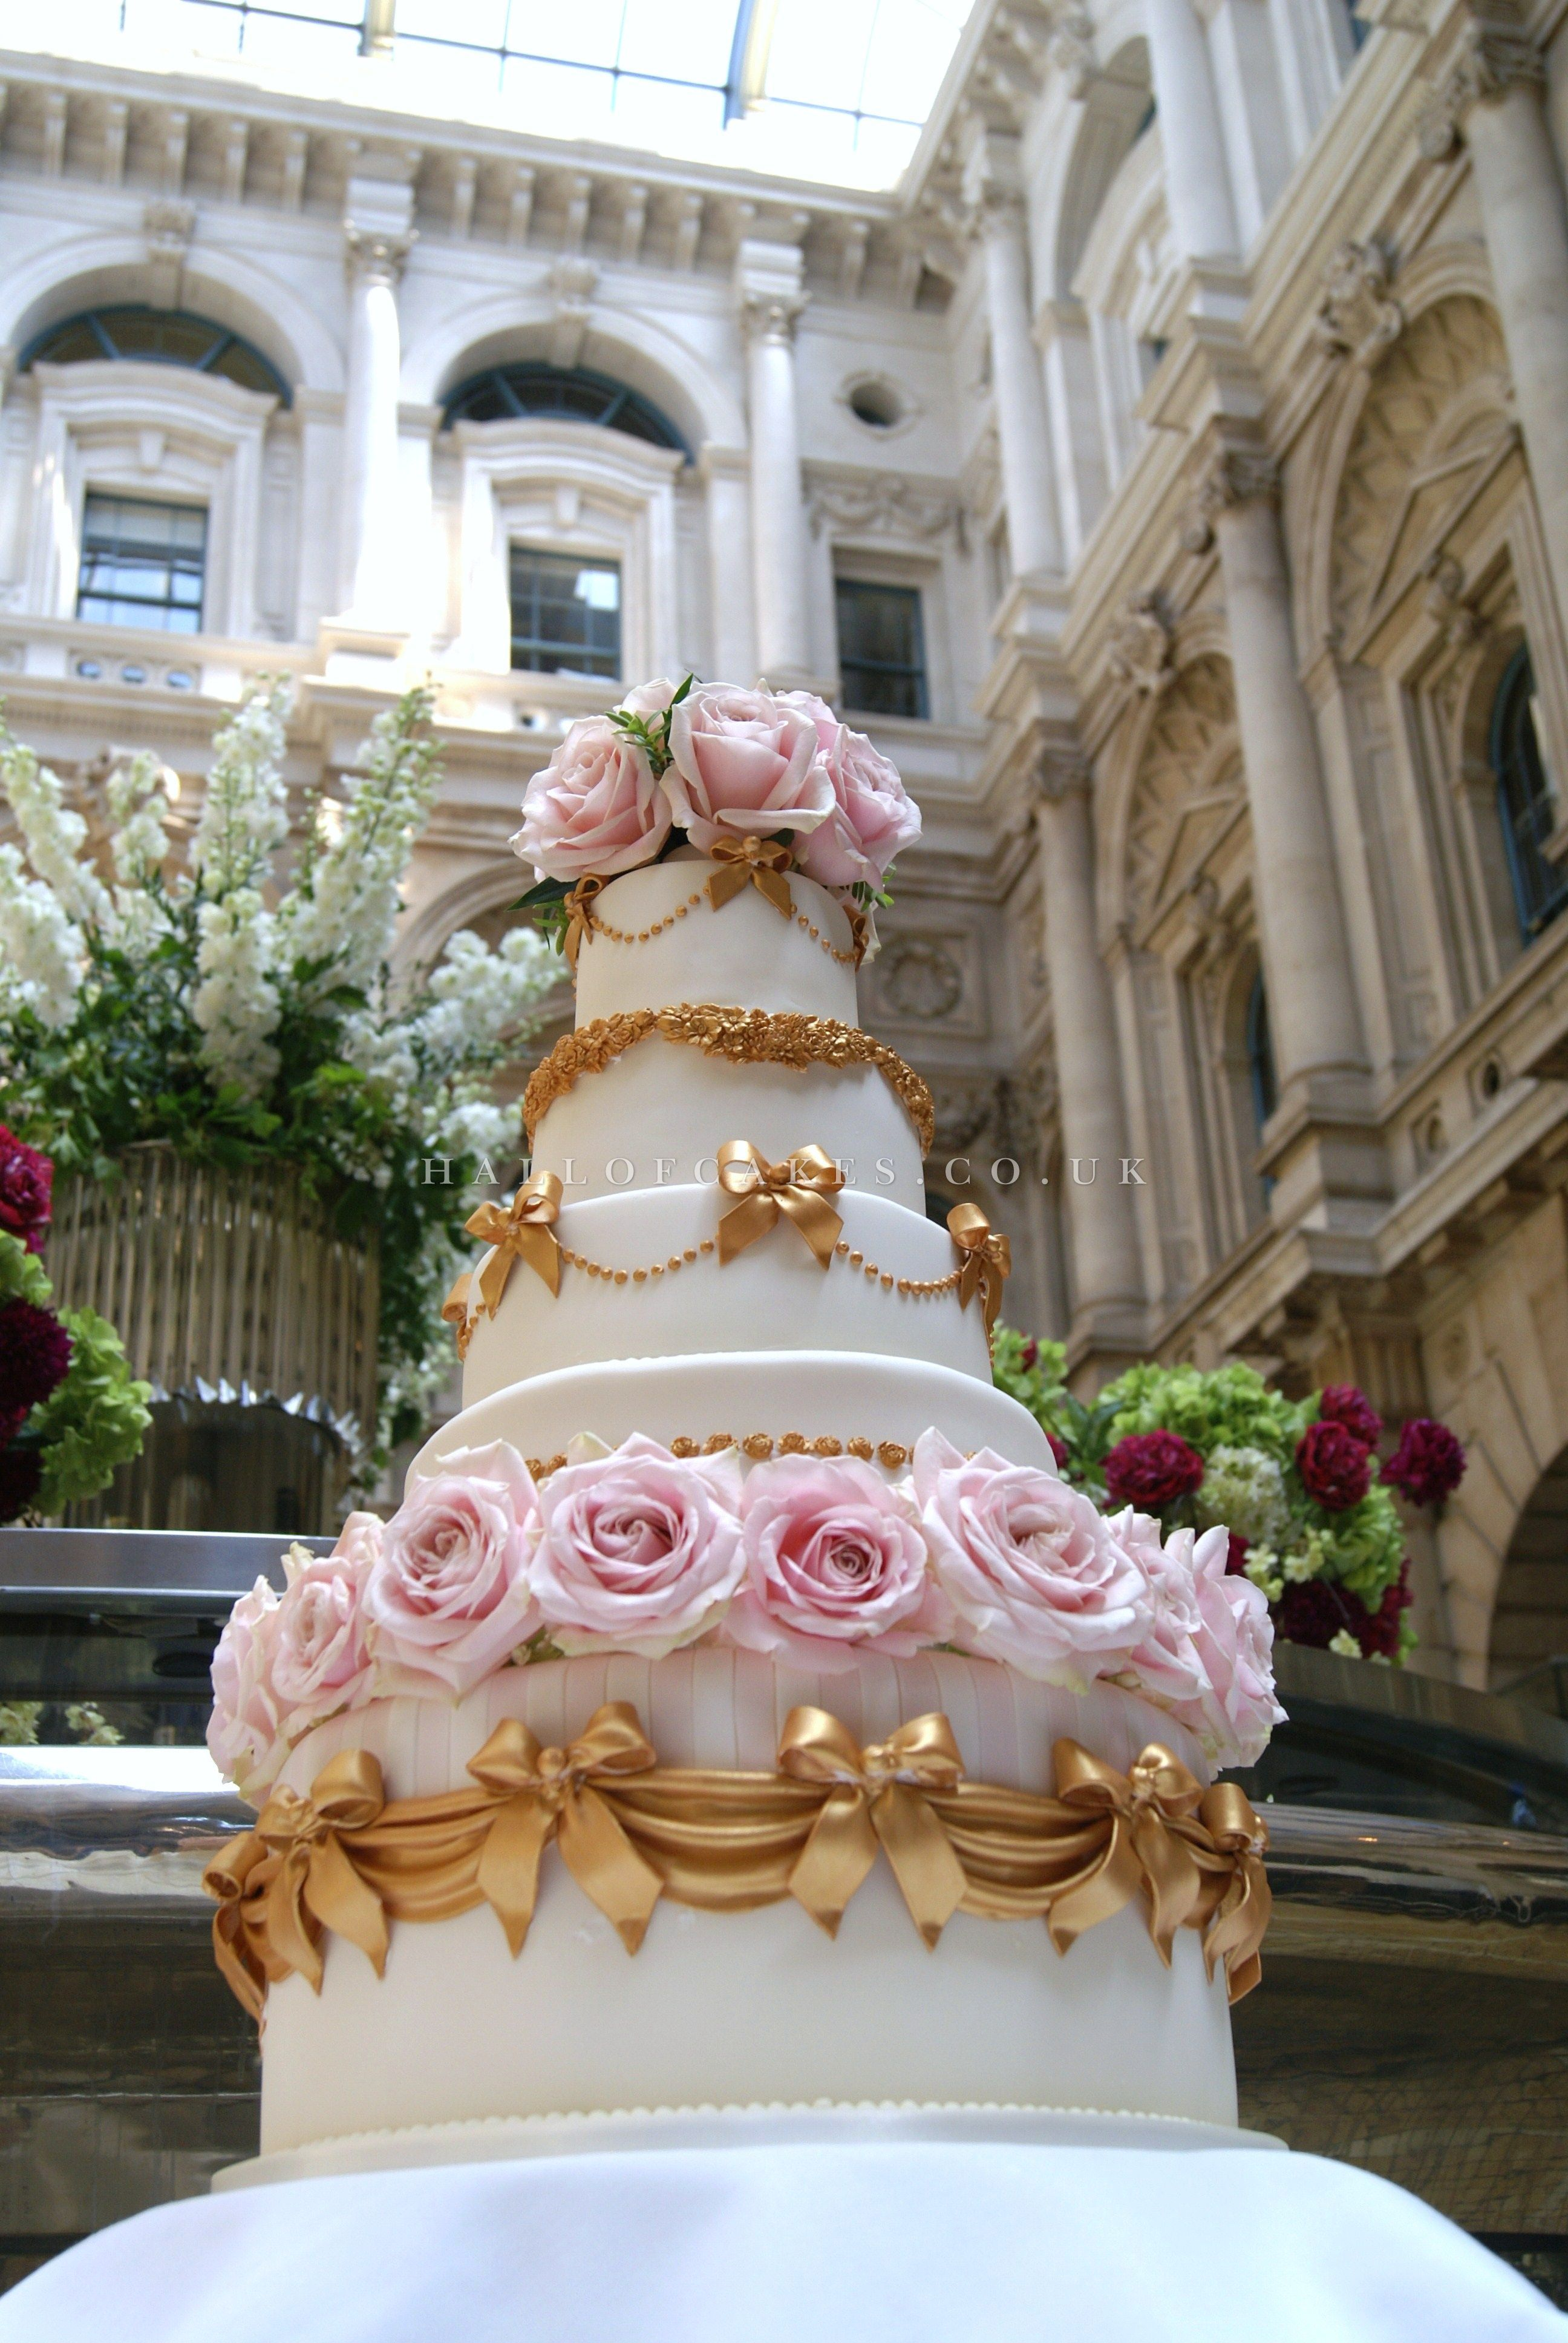 Amazing Gold Swags & Pink Roses Wedding Cake Pink rose